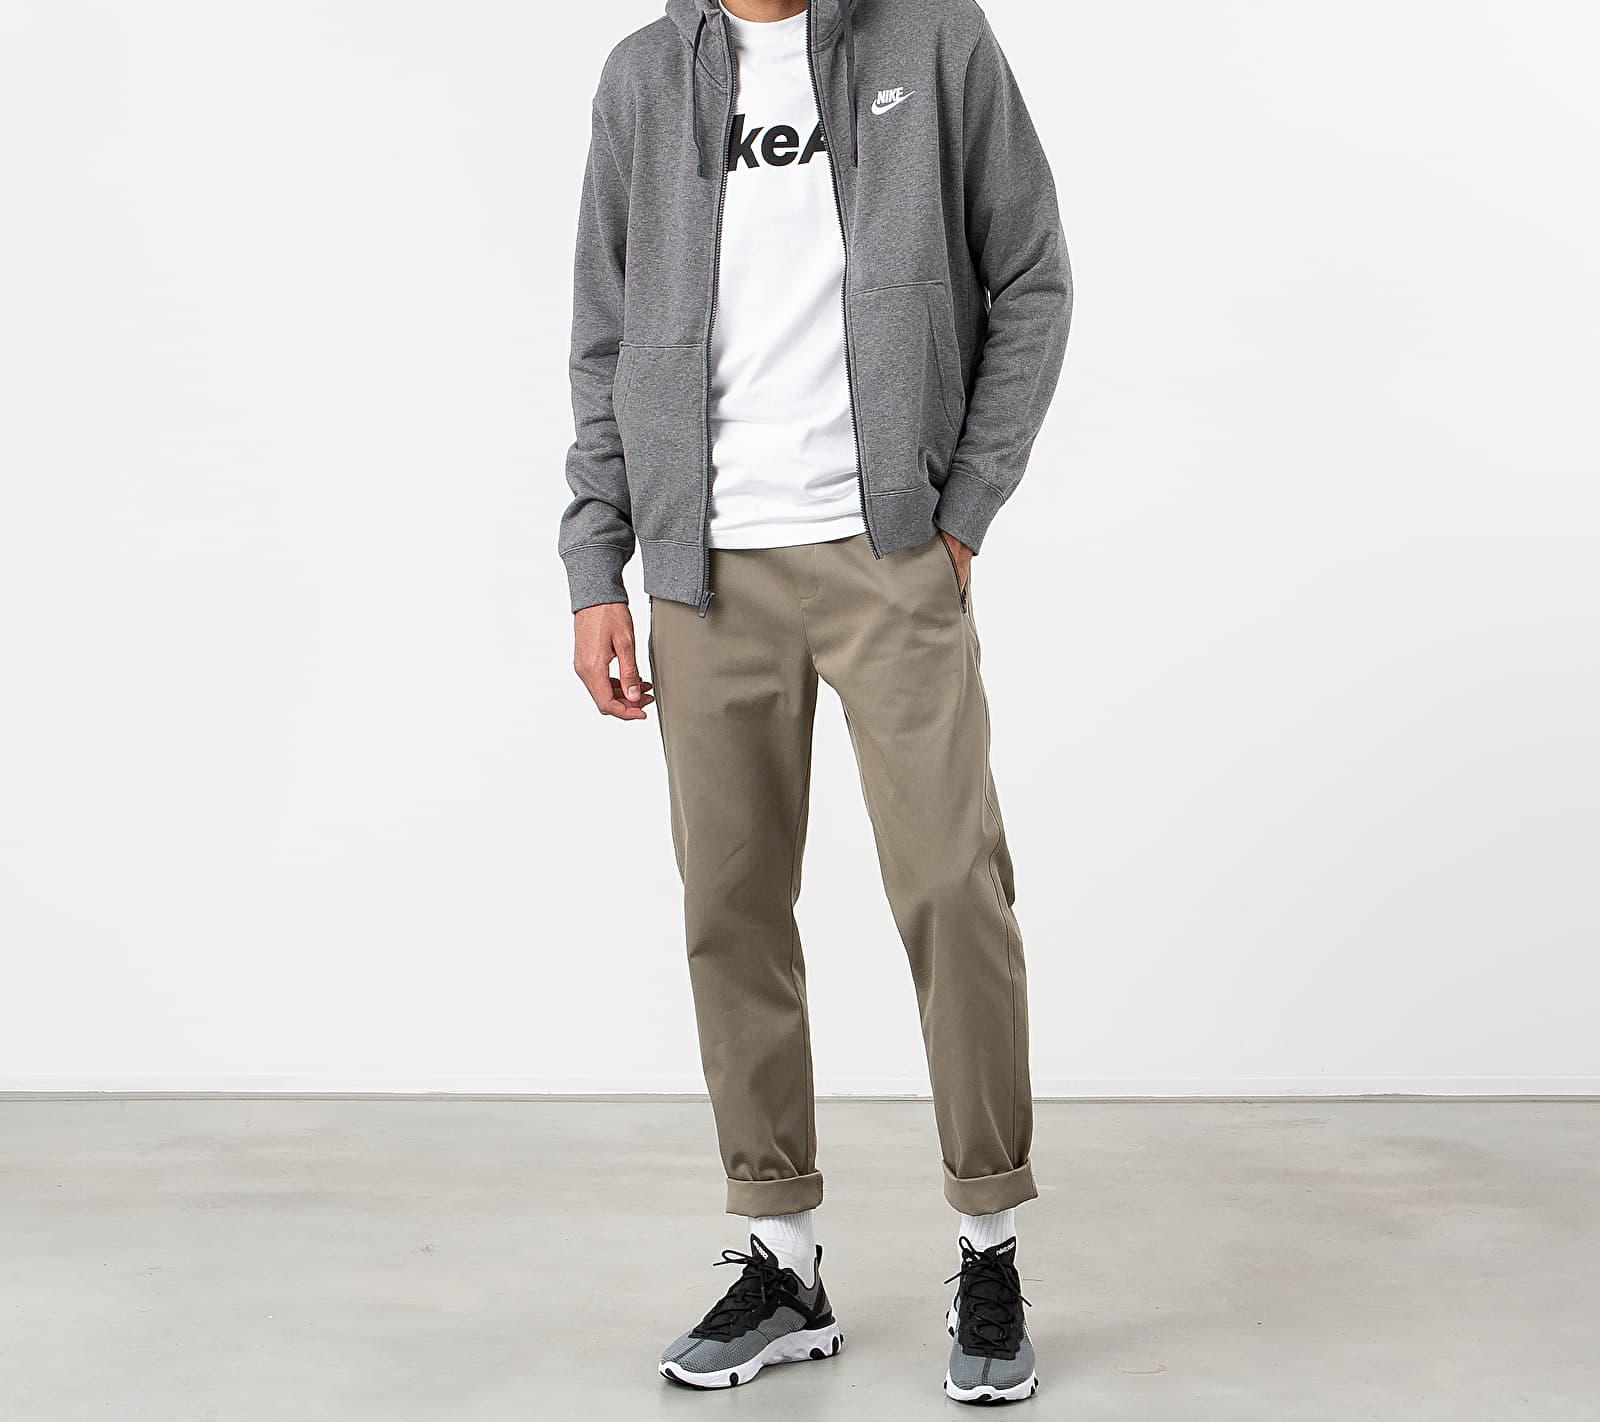 Nike Sportswear Club Fullzip Hoodie Charcoal Heathr/ Anthracite/ White, Gray